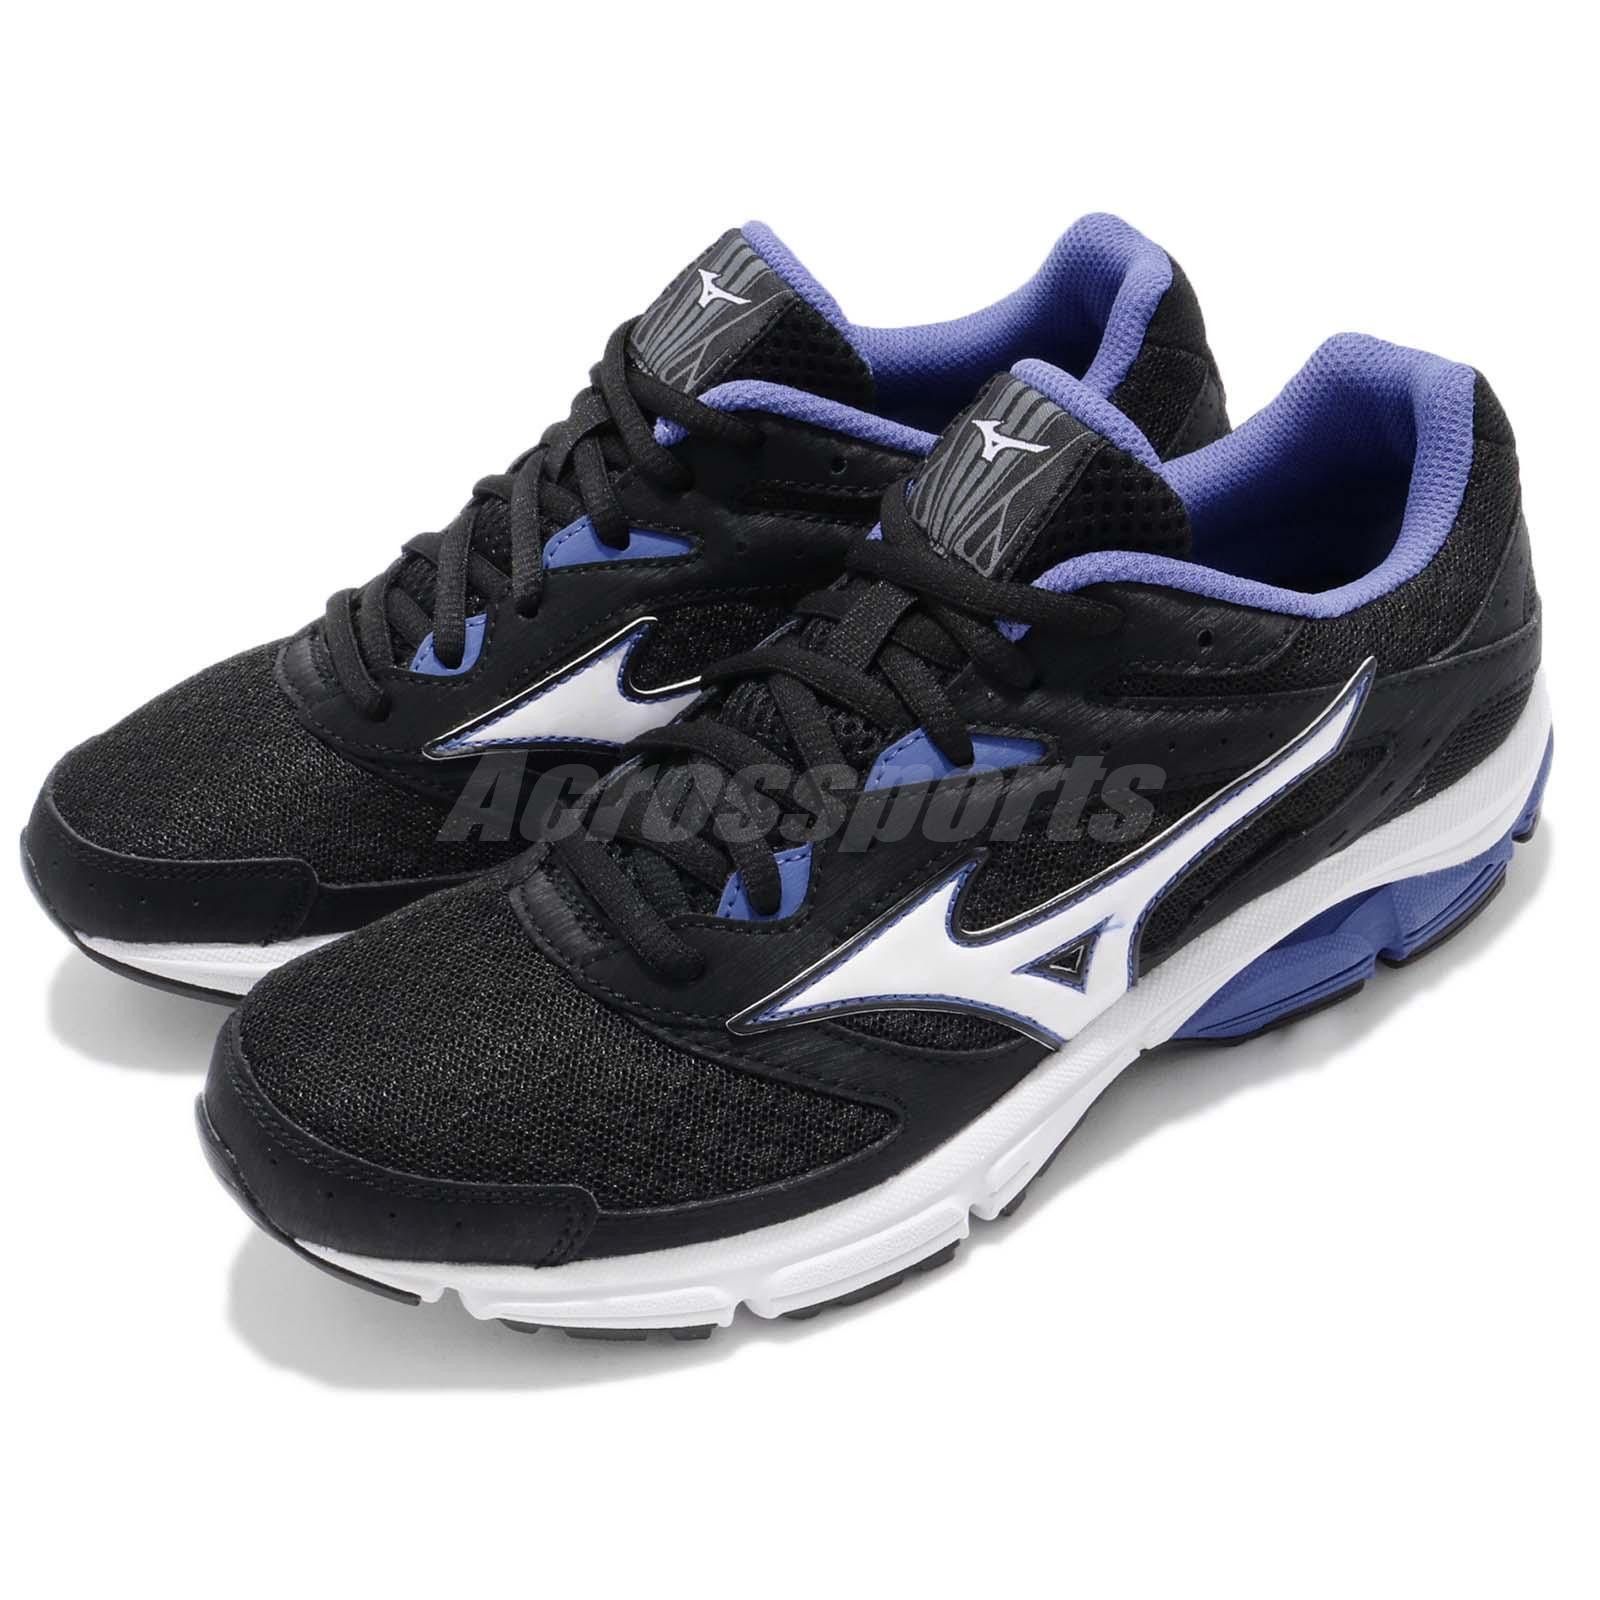 Mizuno Wave Surge nero bianca blu donna Running scarpe scarpe da ginnastica J1GD1713-08